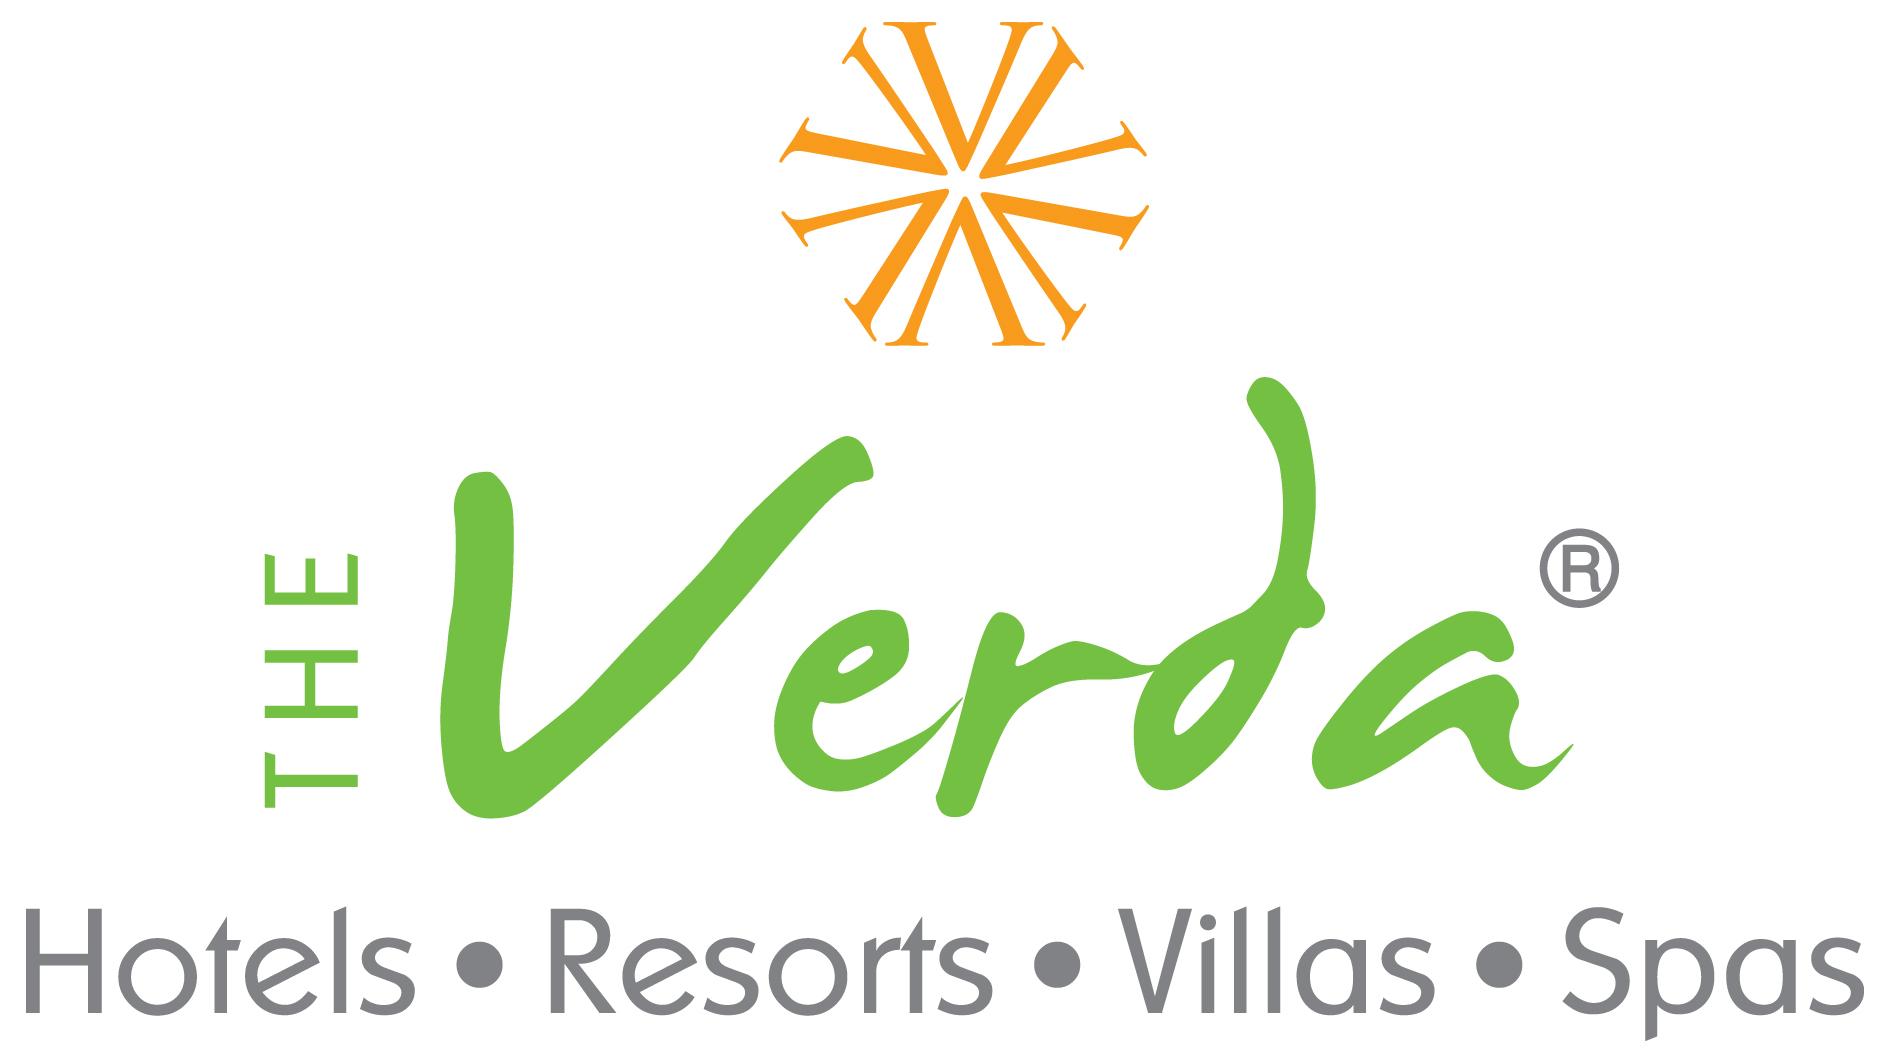 The Verda Hubli